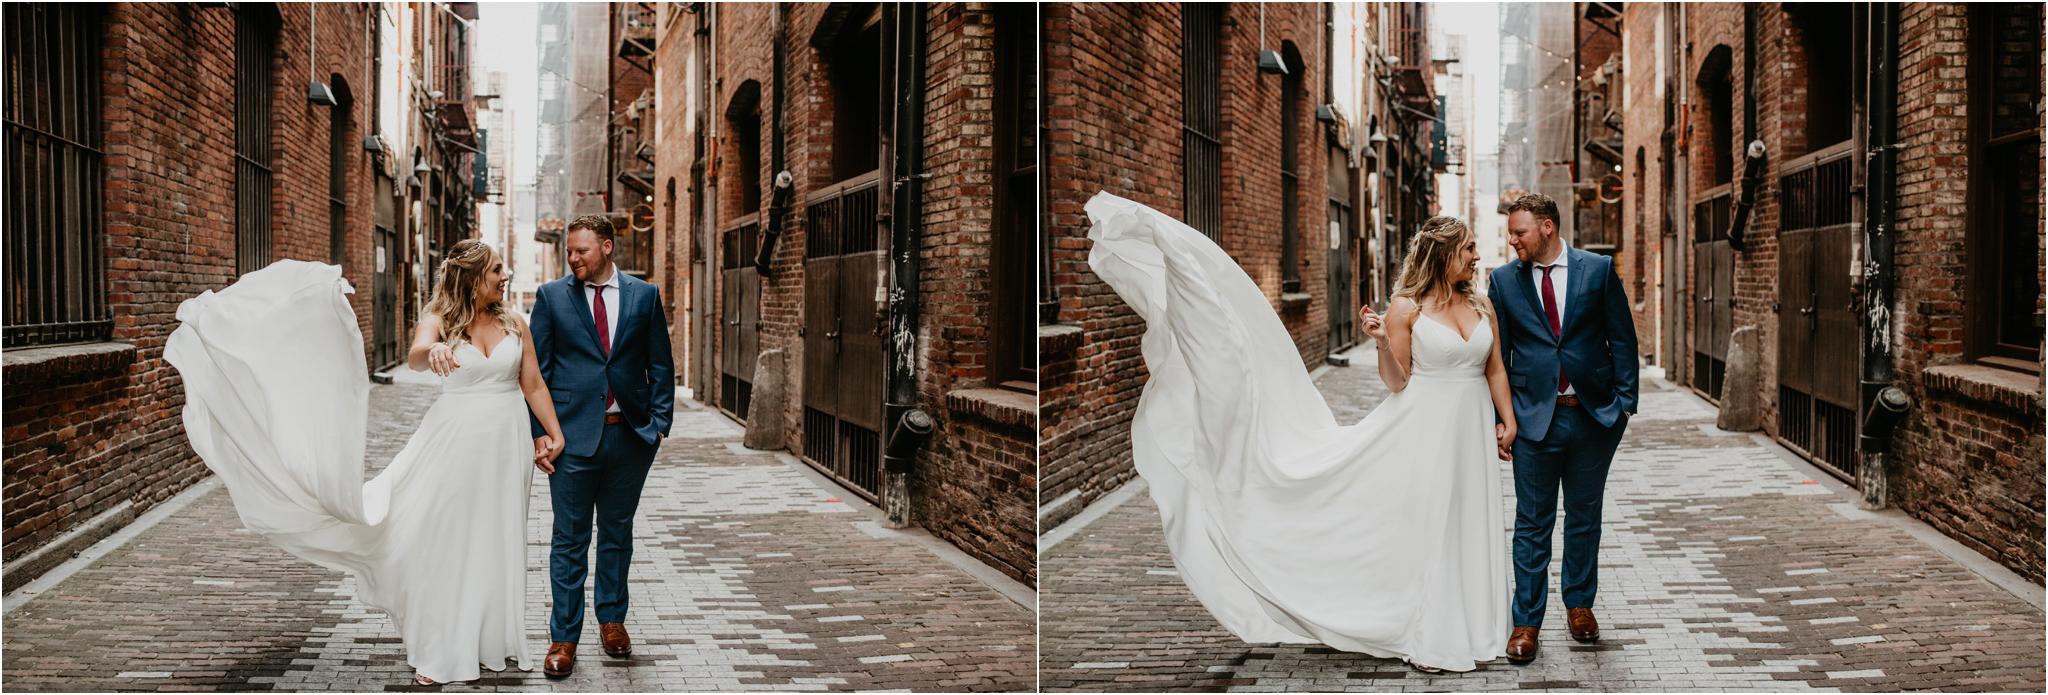 laura-and-matt-metropolist-urban-seattle-wedding-photographer-075.jpg